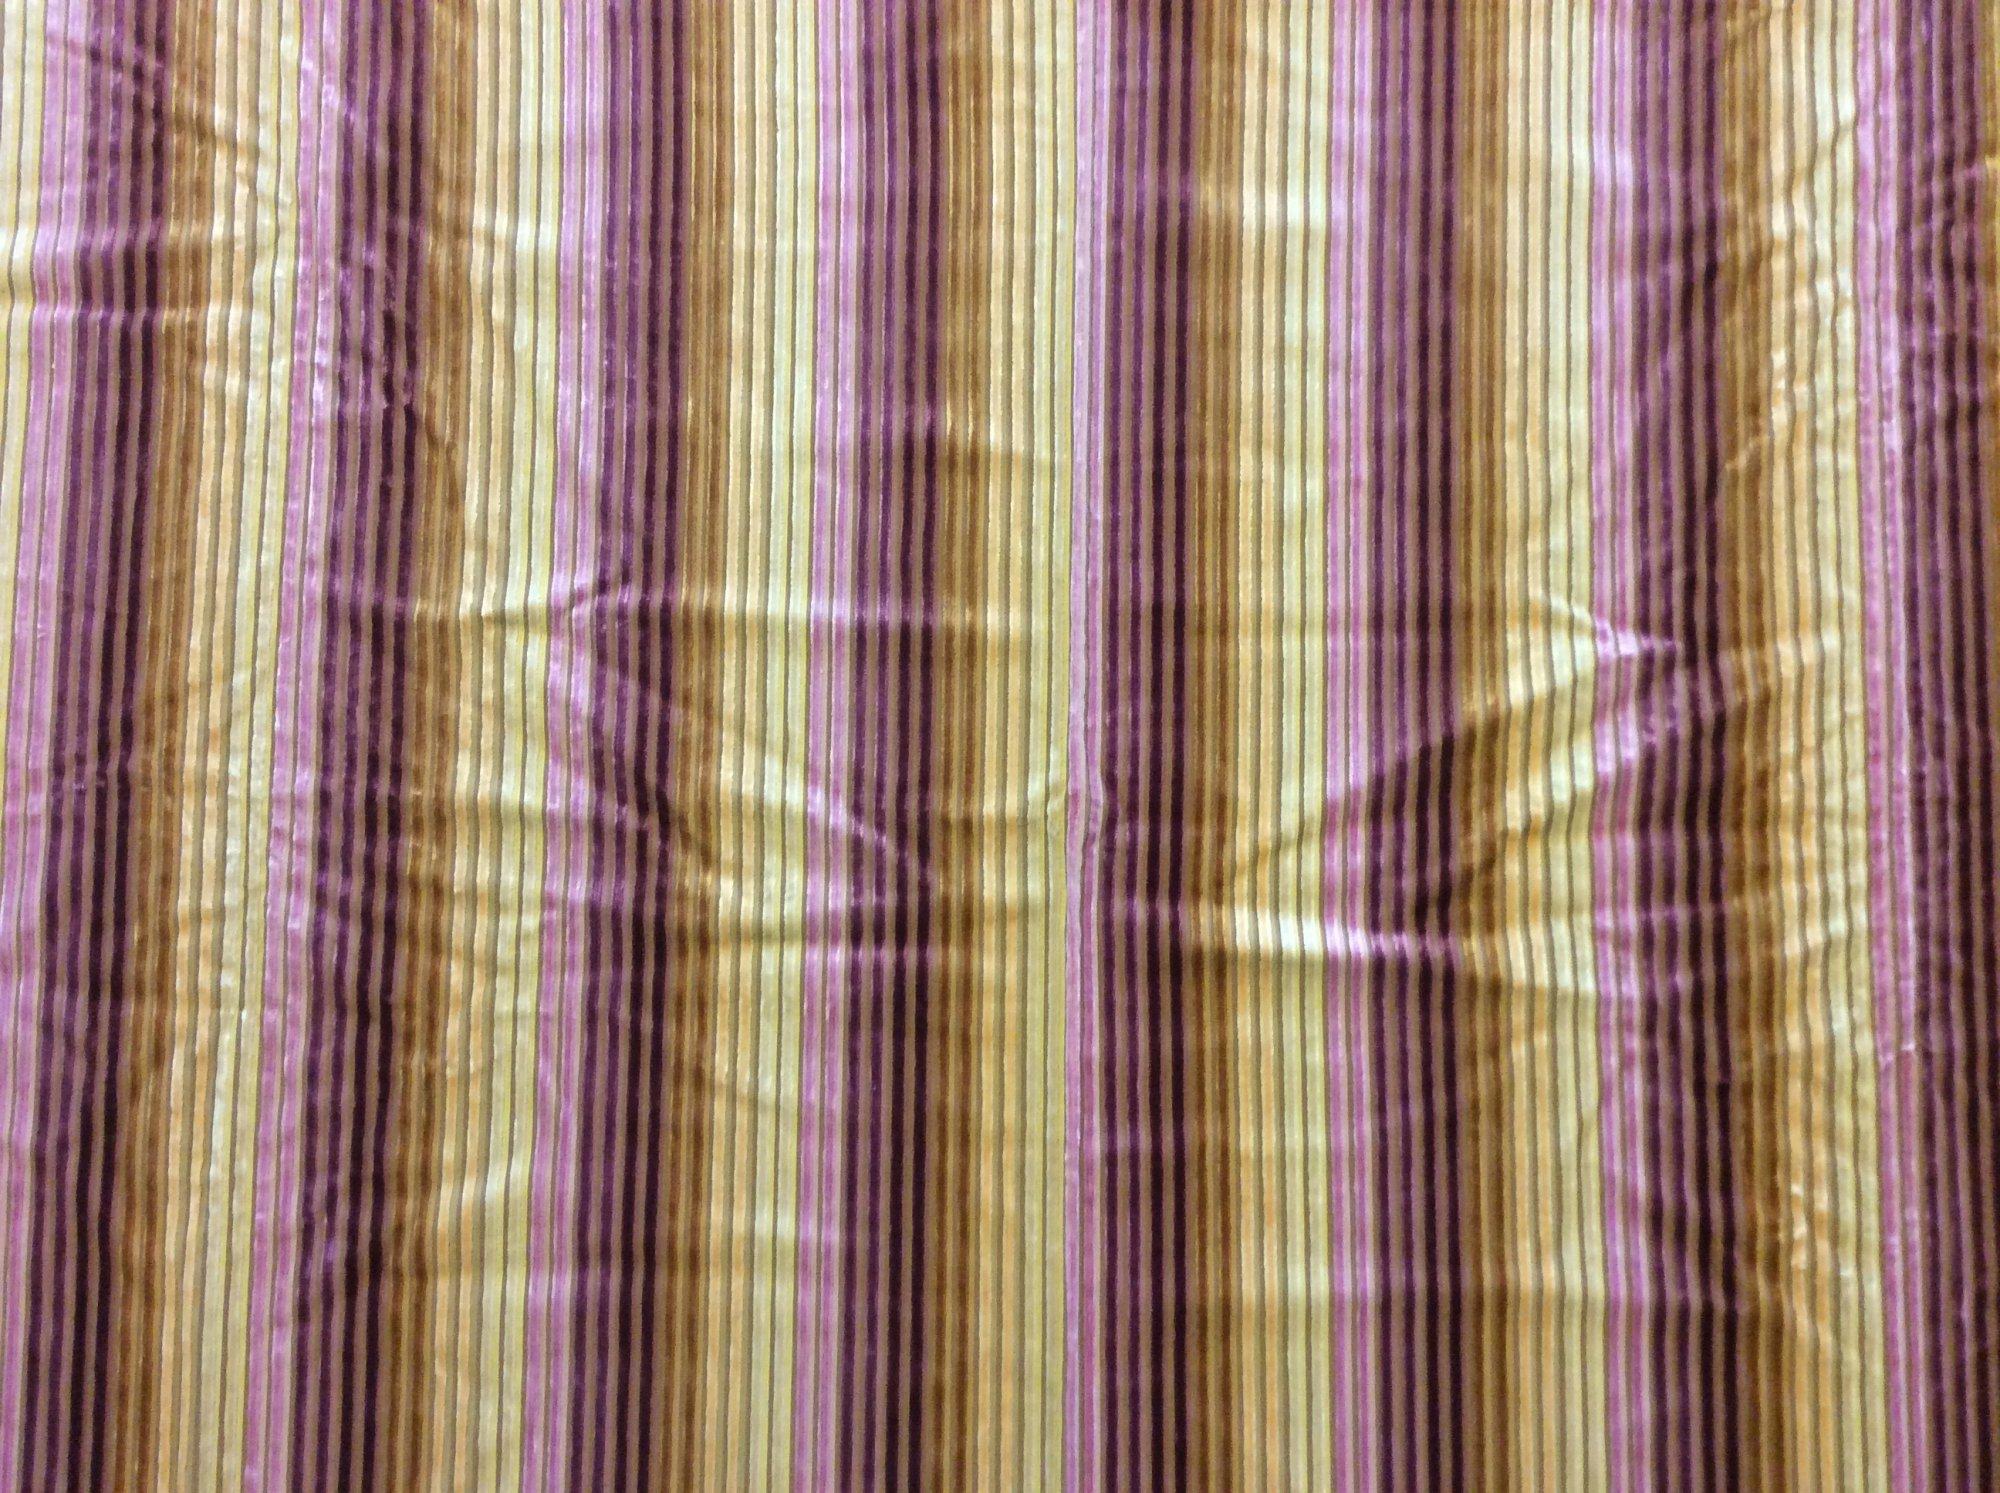 High End Remnant, Last Piece! Purple and Gold Ombre Striped Cut Velvet Stripe Home Decor Fabric REM044